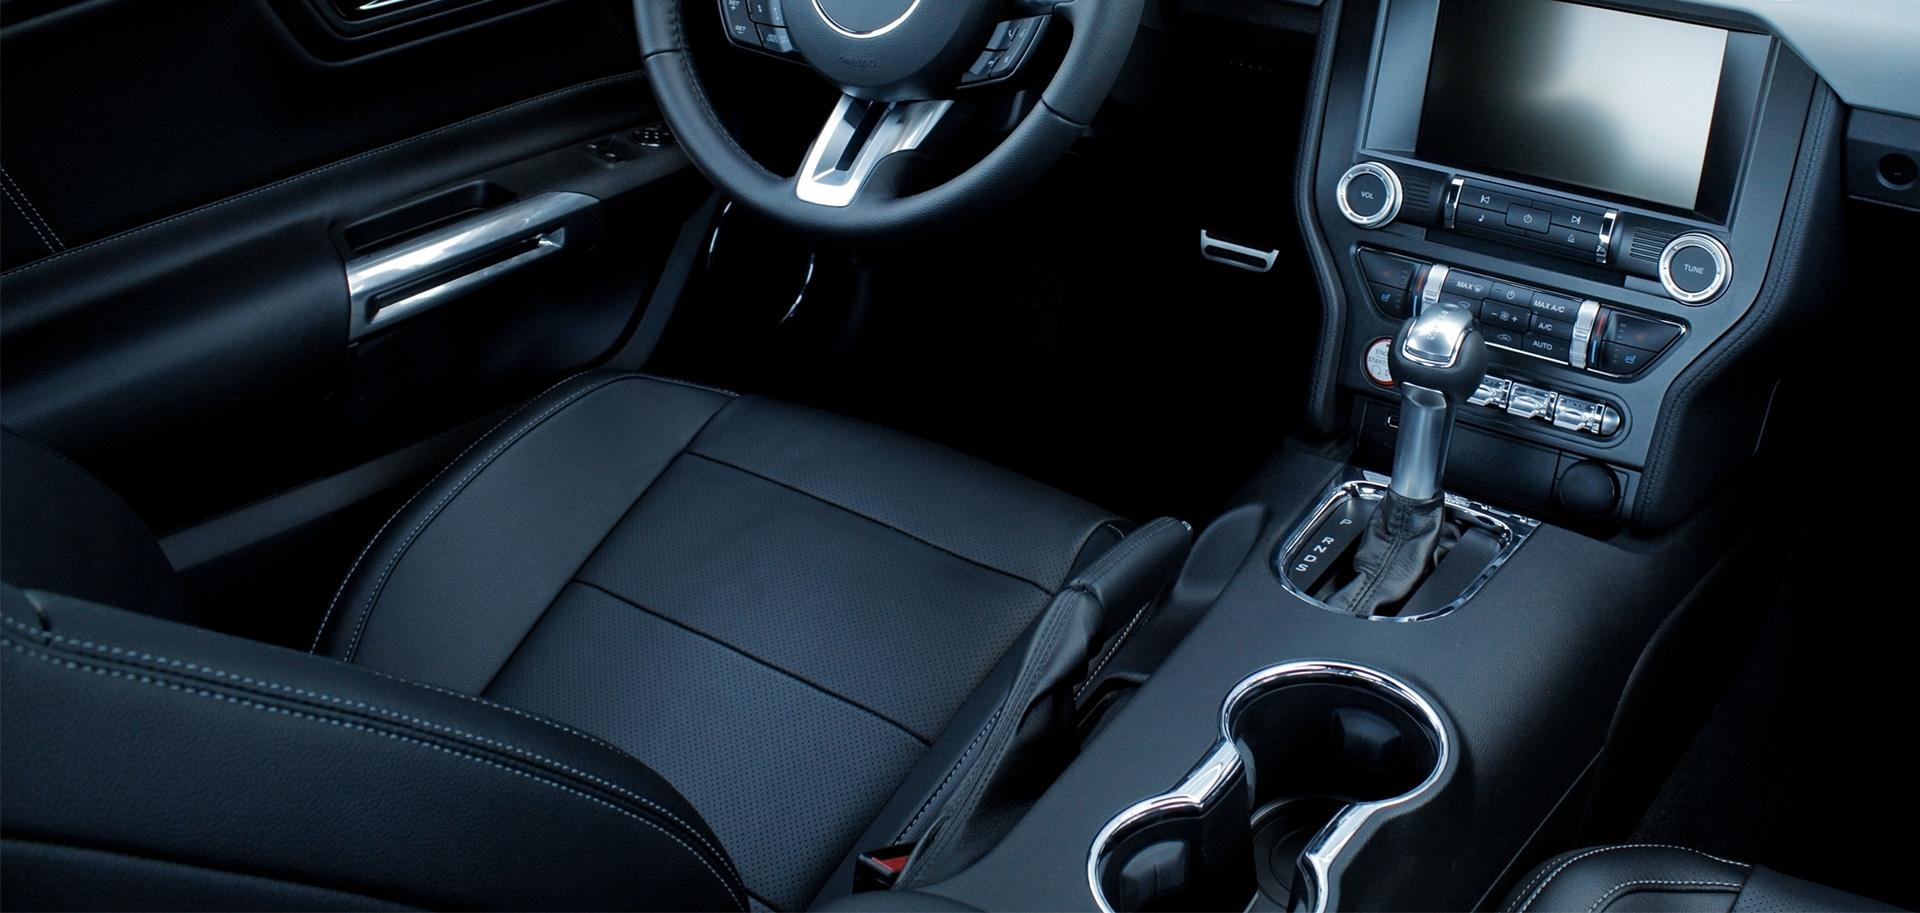 Interior Detailing Near Me >> Car Interior Detailing Near Me 2 D L Auto Detailing And